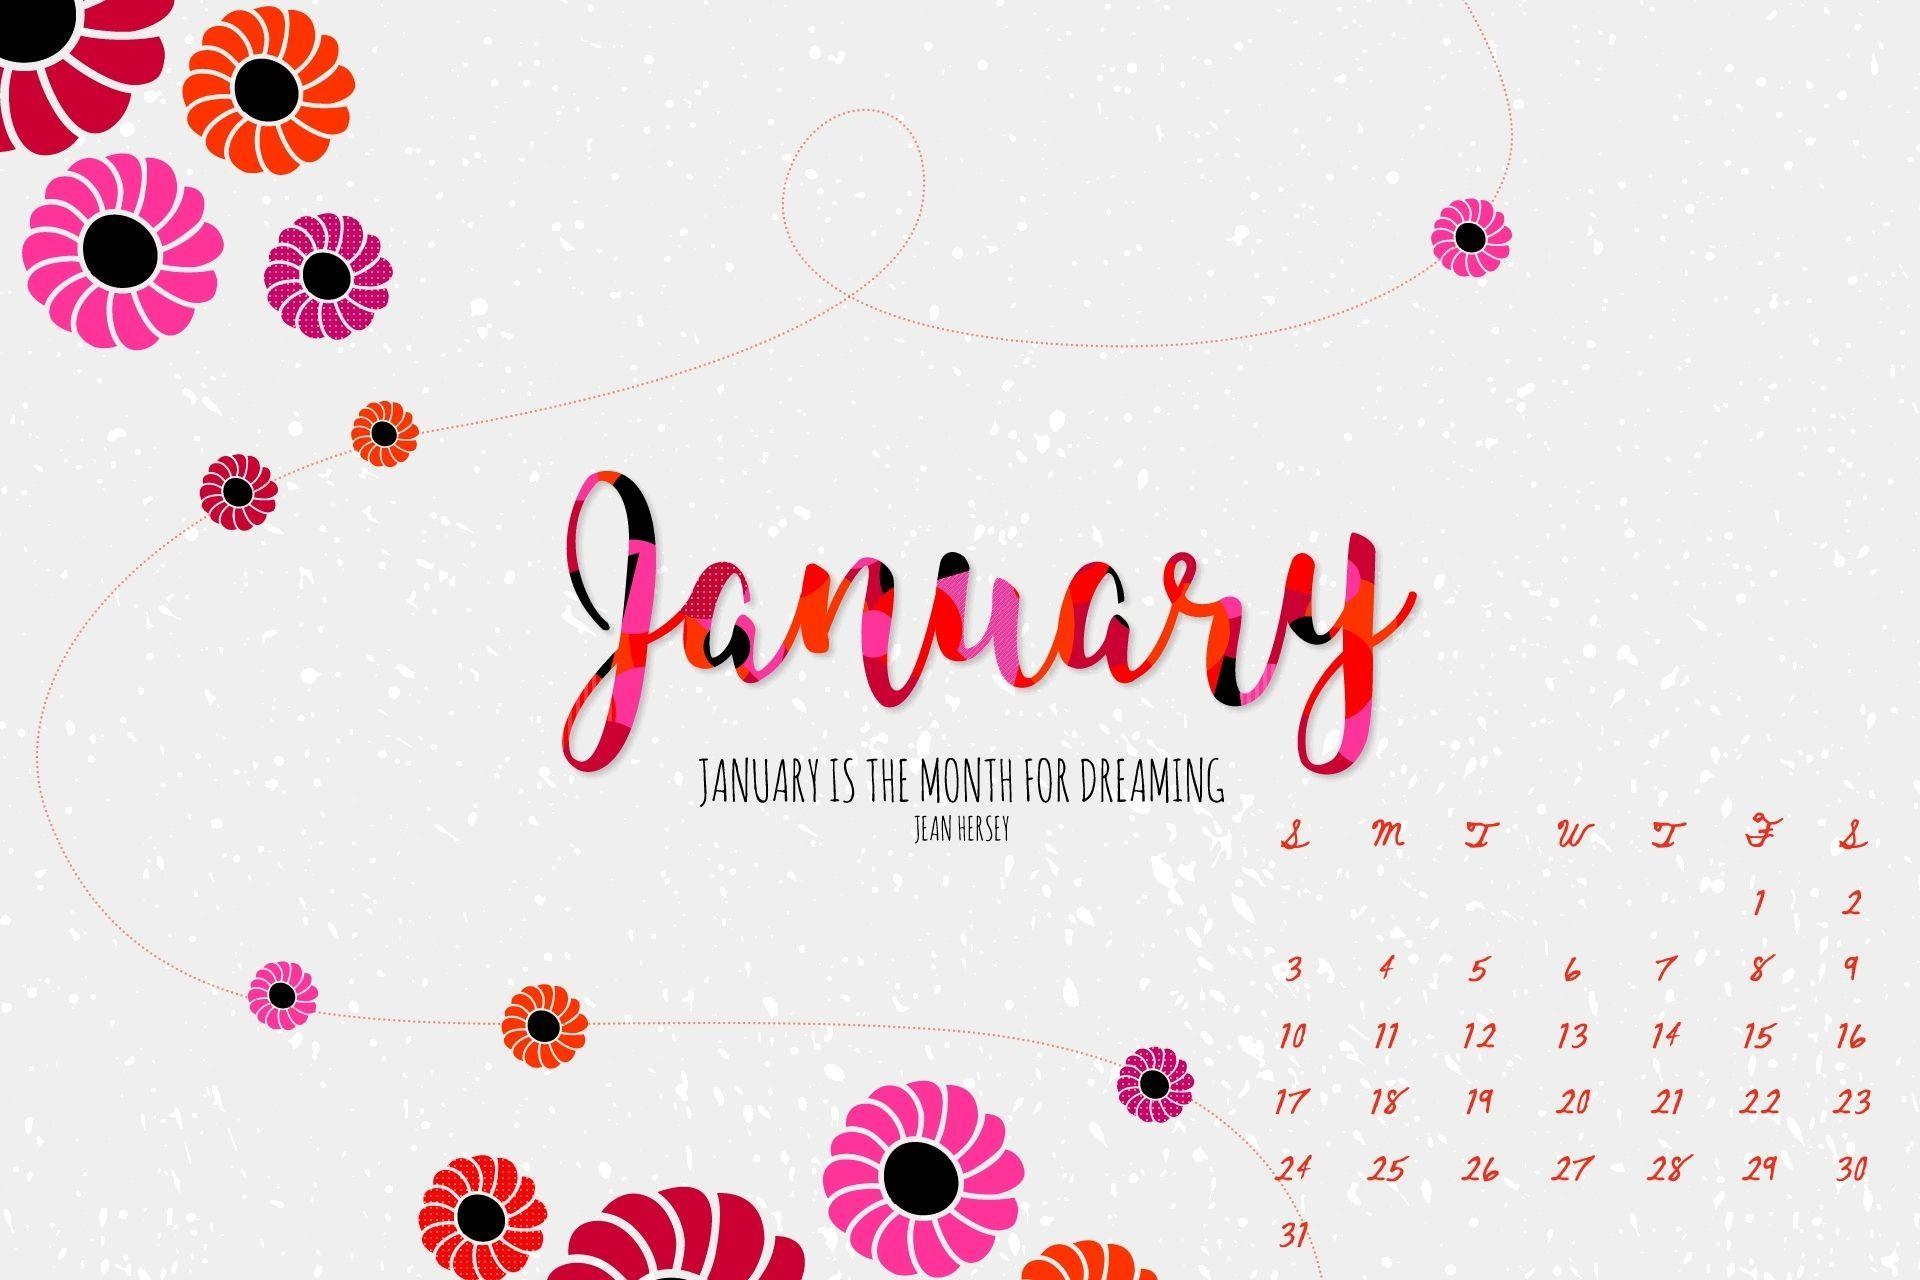 Pictures of Wallpaper Calendar 2021